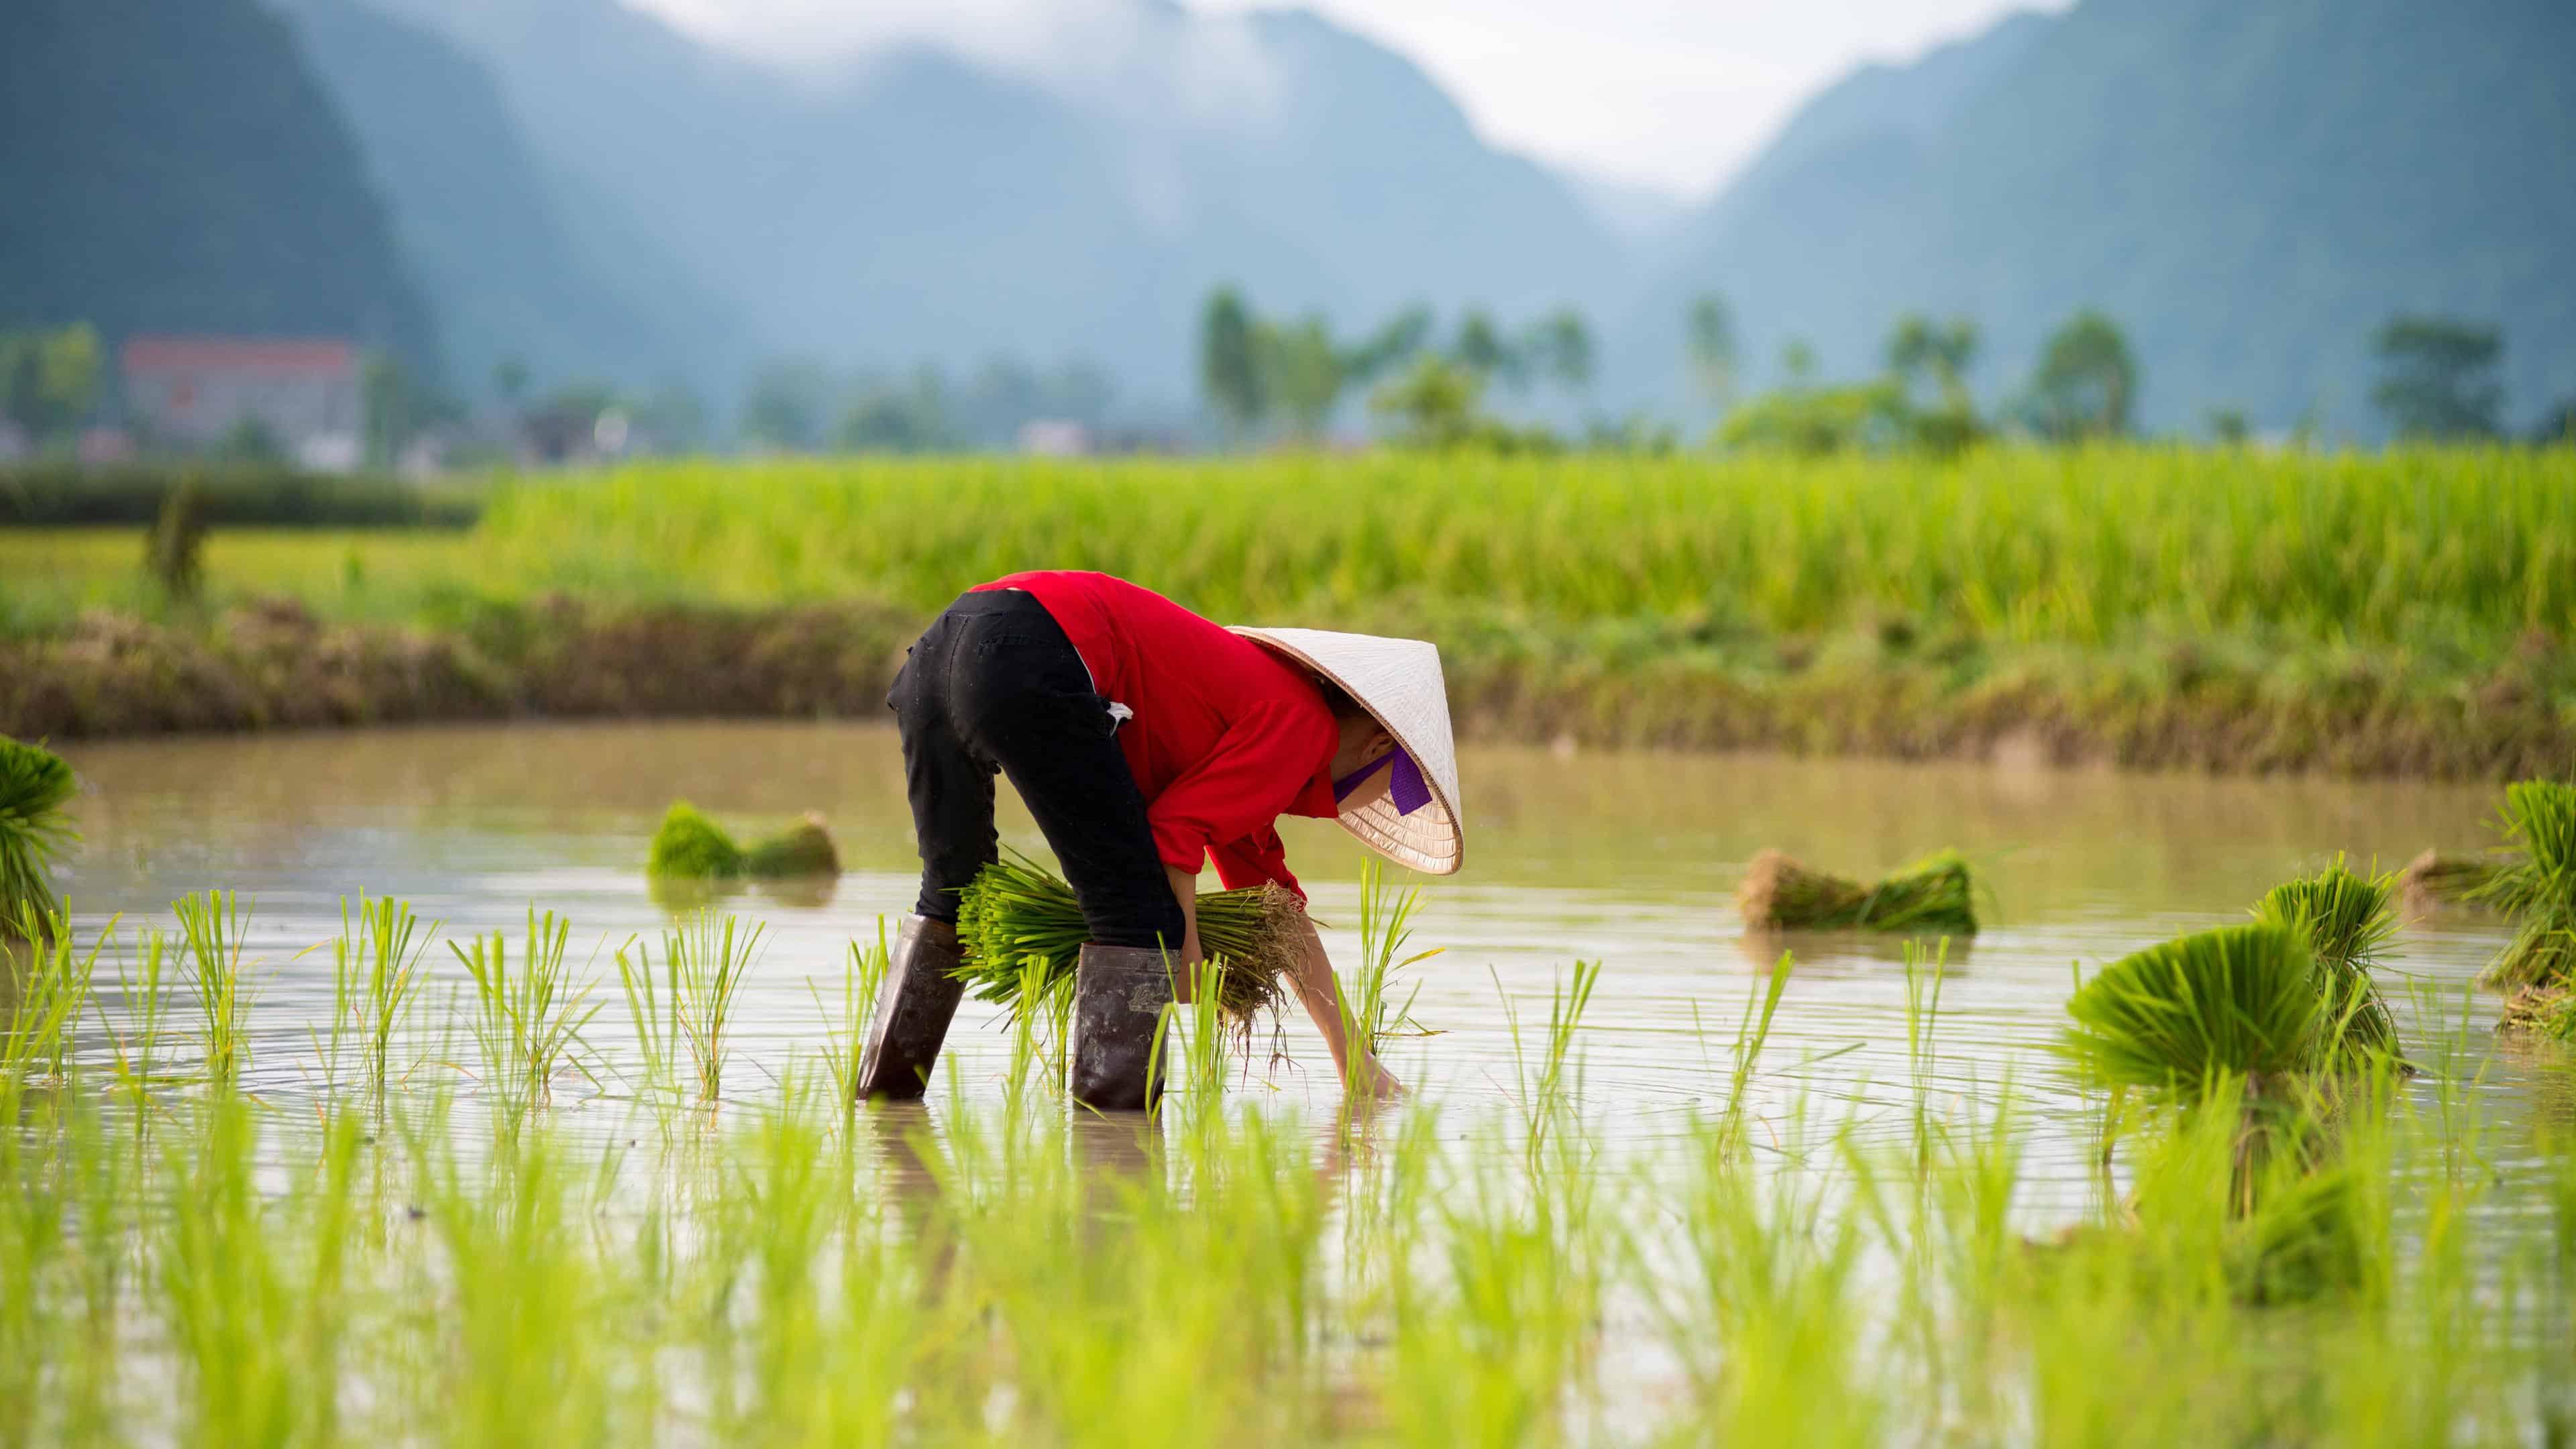 Rice Farmer Vietnam Uhd 4k Wallpaper Pixelz